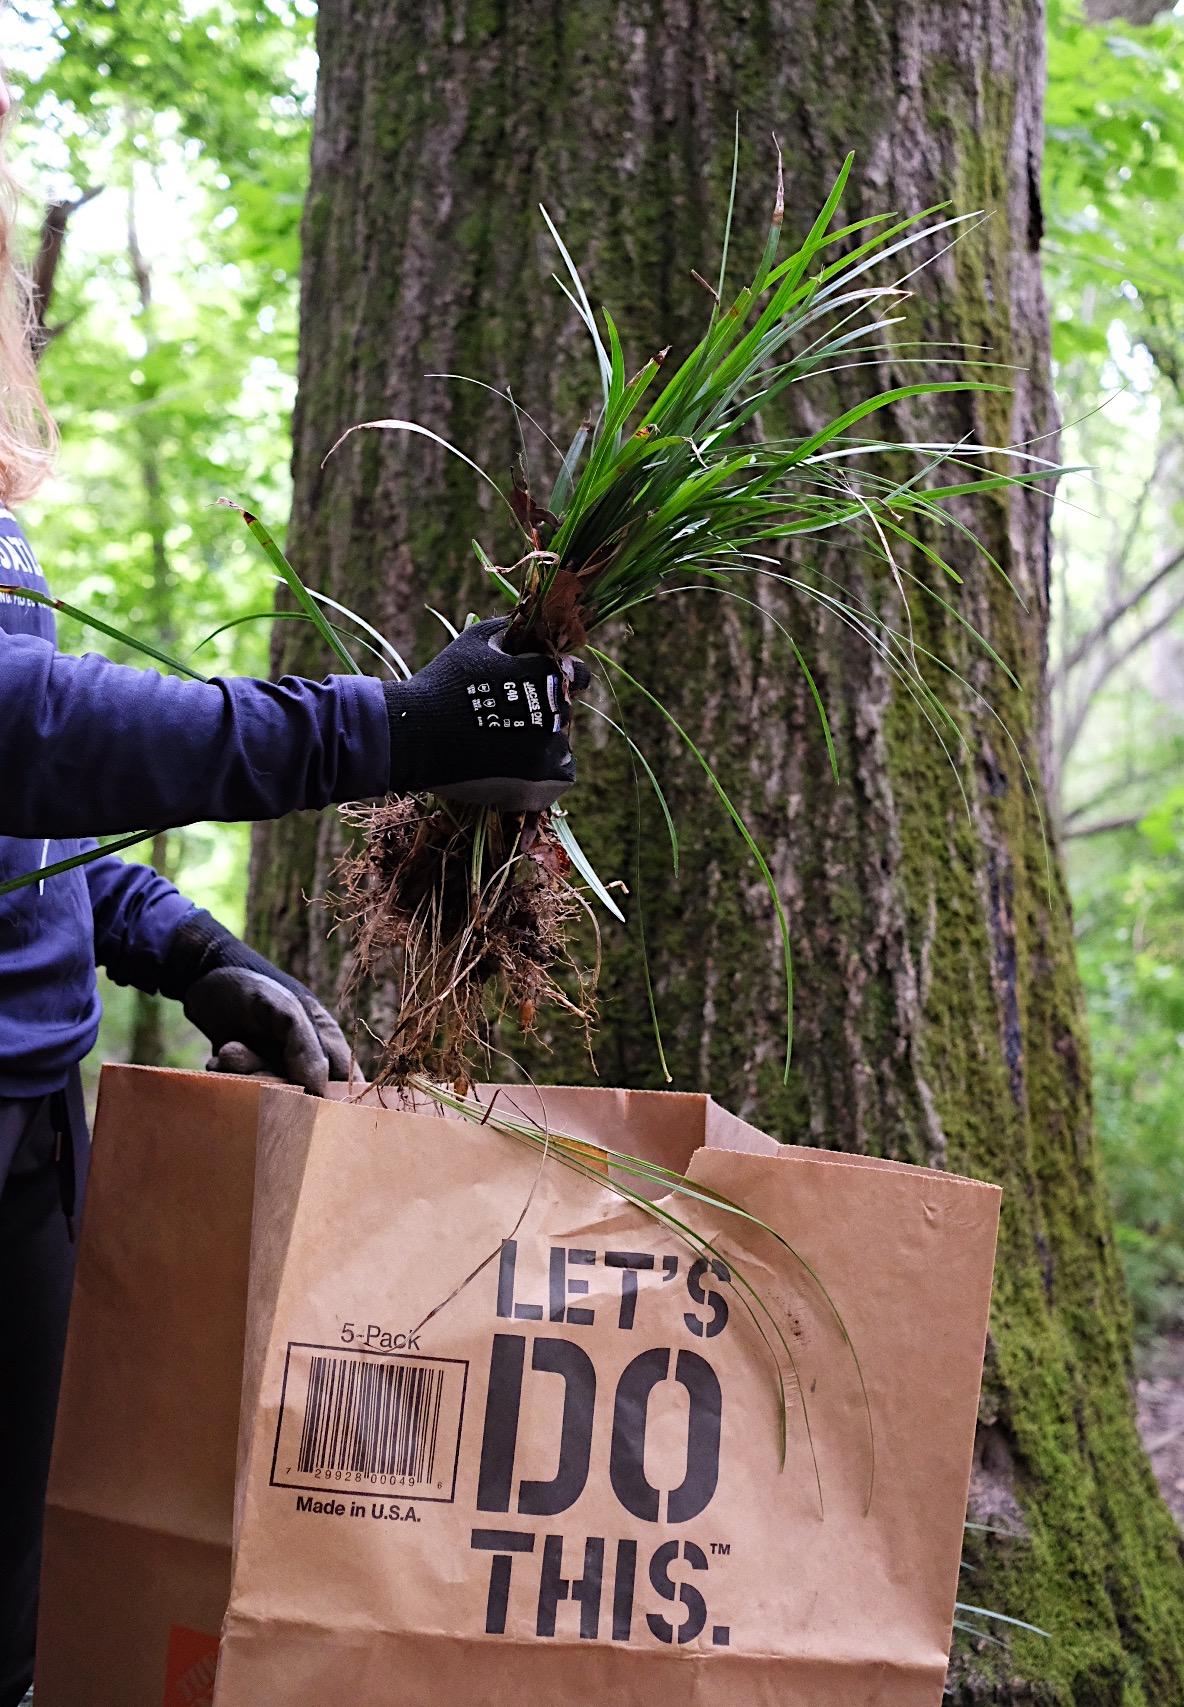 Putting mondo grass into a compost bag